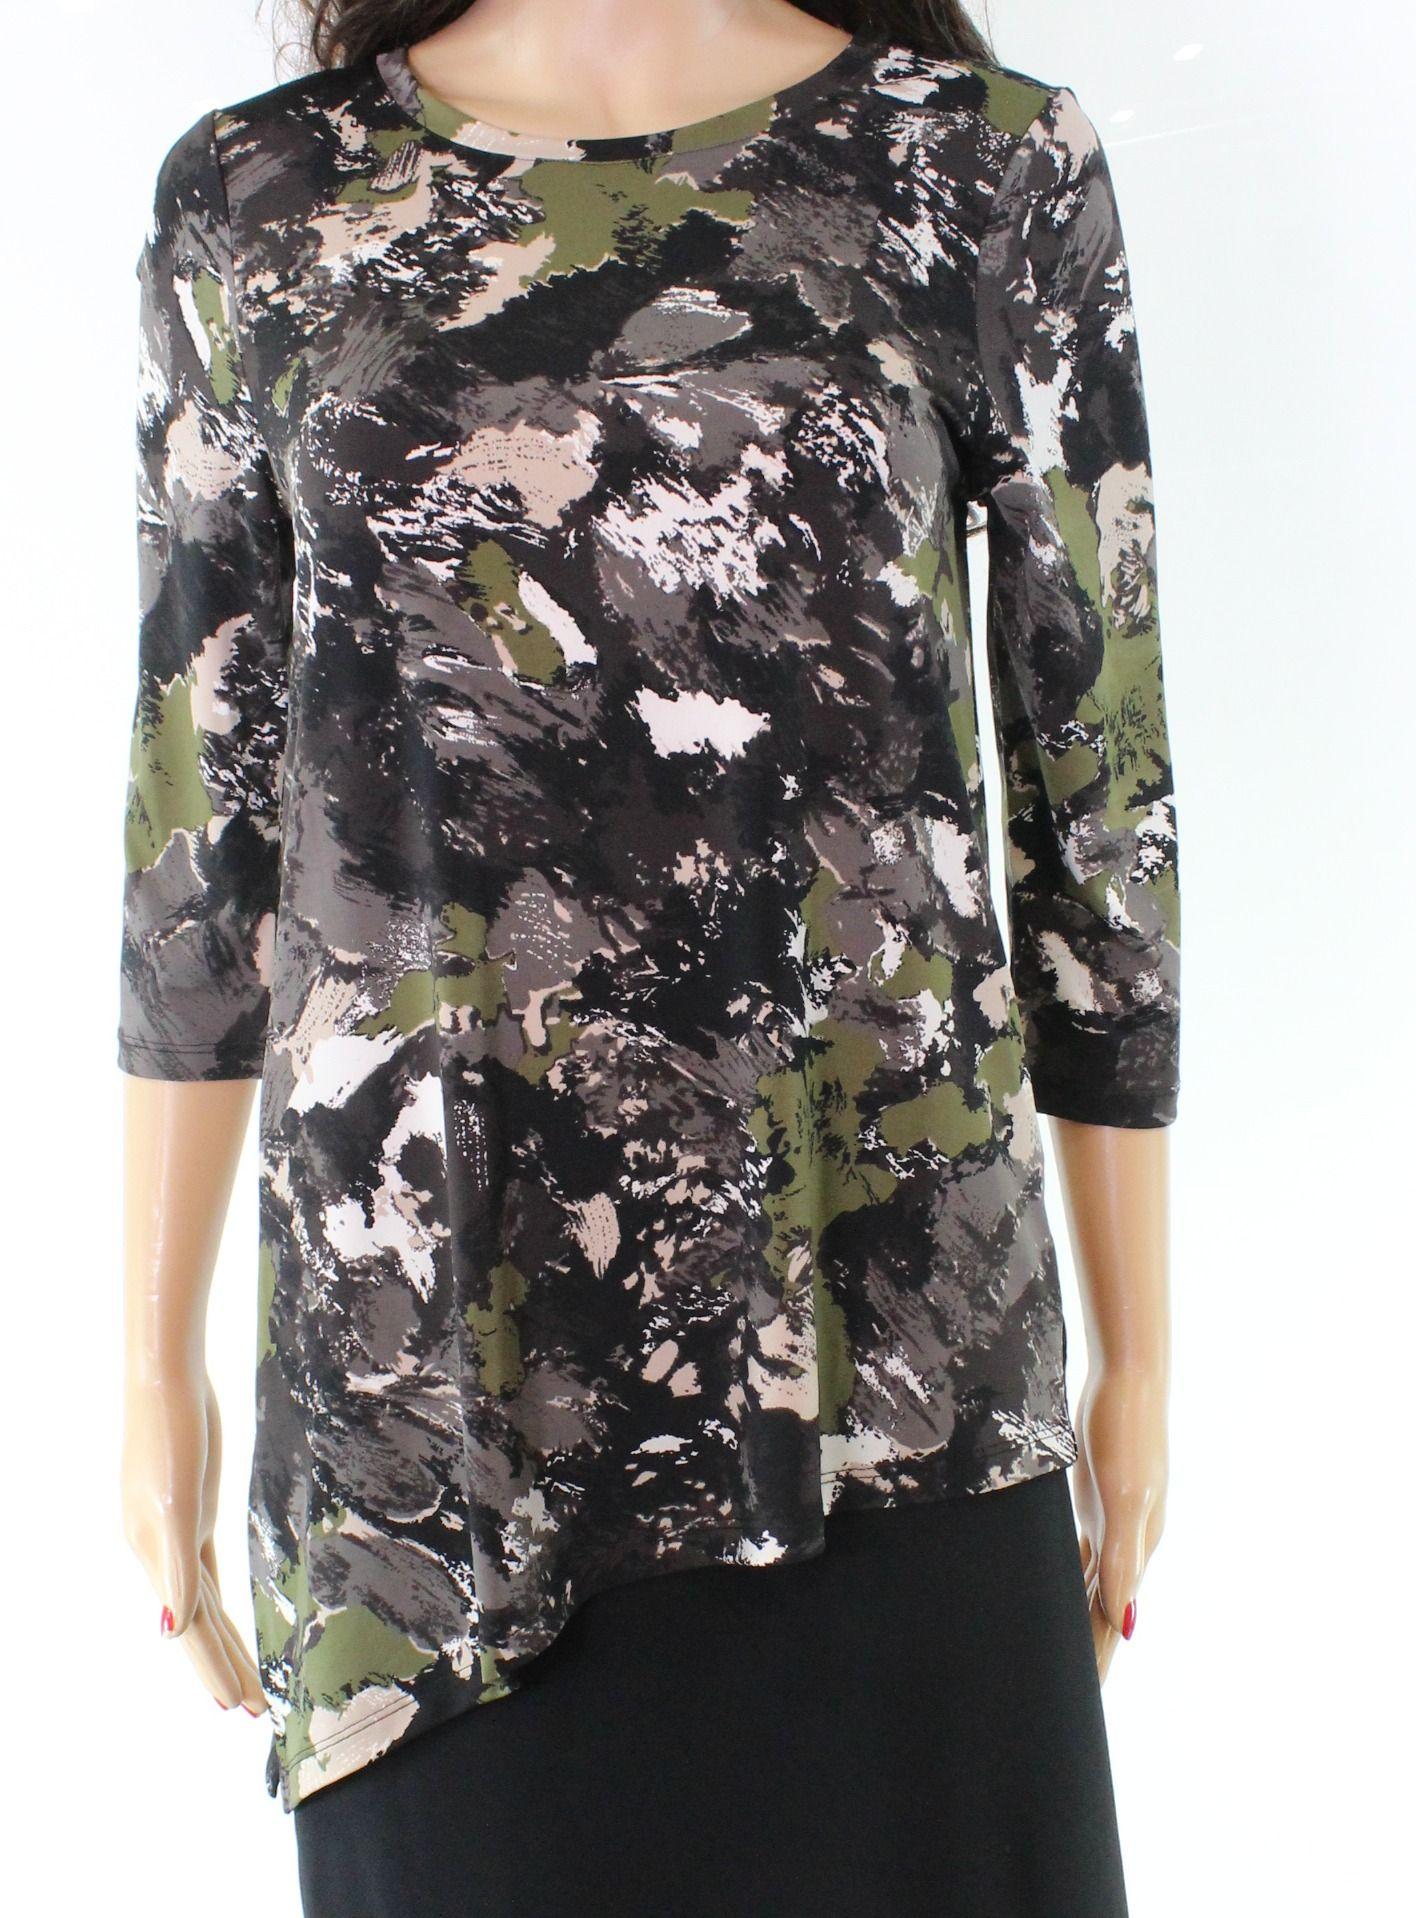 Halston Women's Blouse Black Green Size XS 3/4 Sleeve Scoop Neck